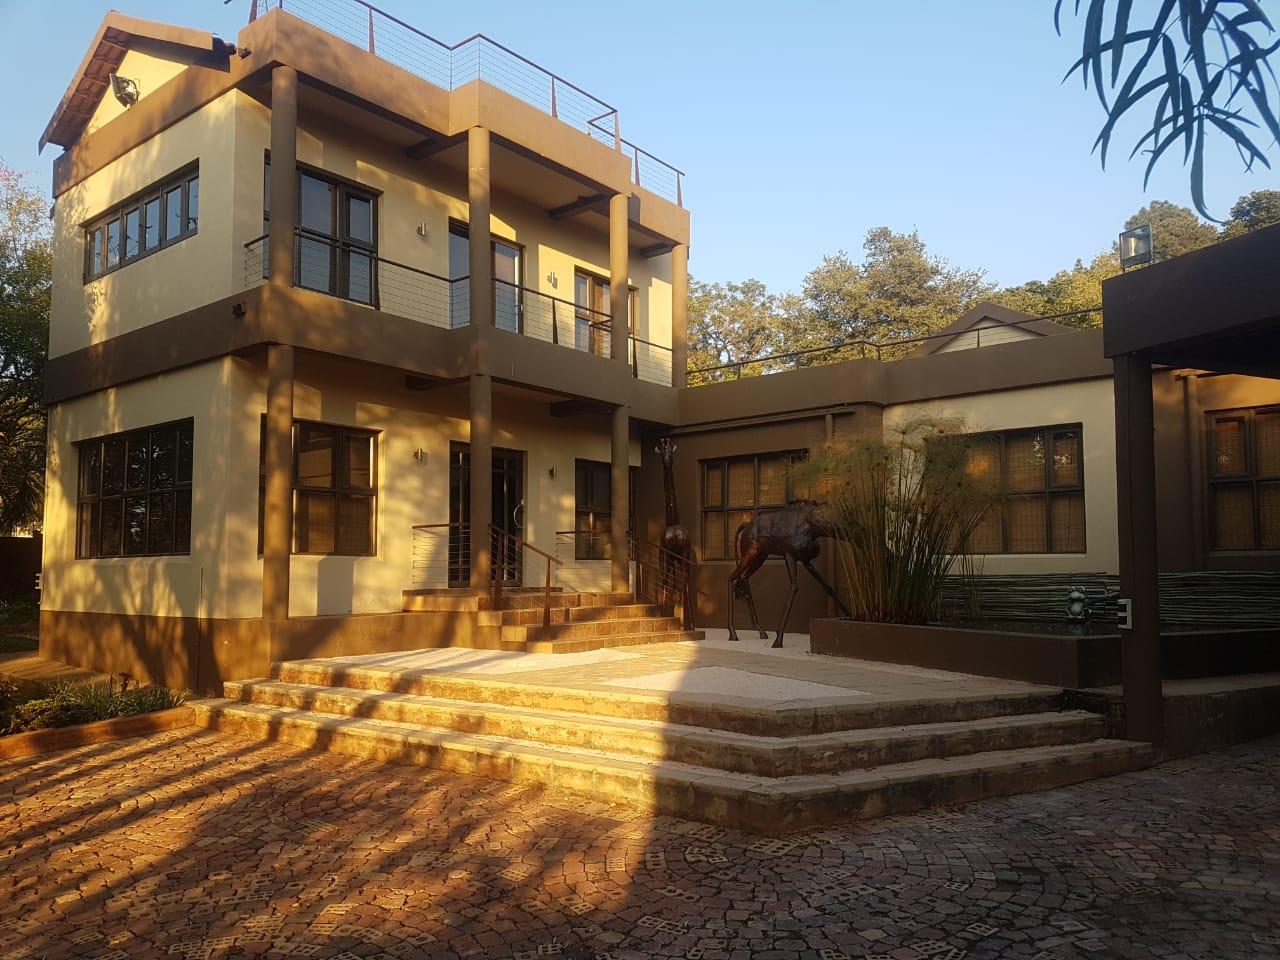 Luxury House at Olifantsnek dam